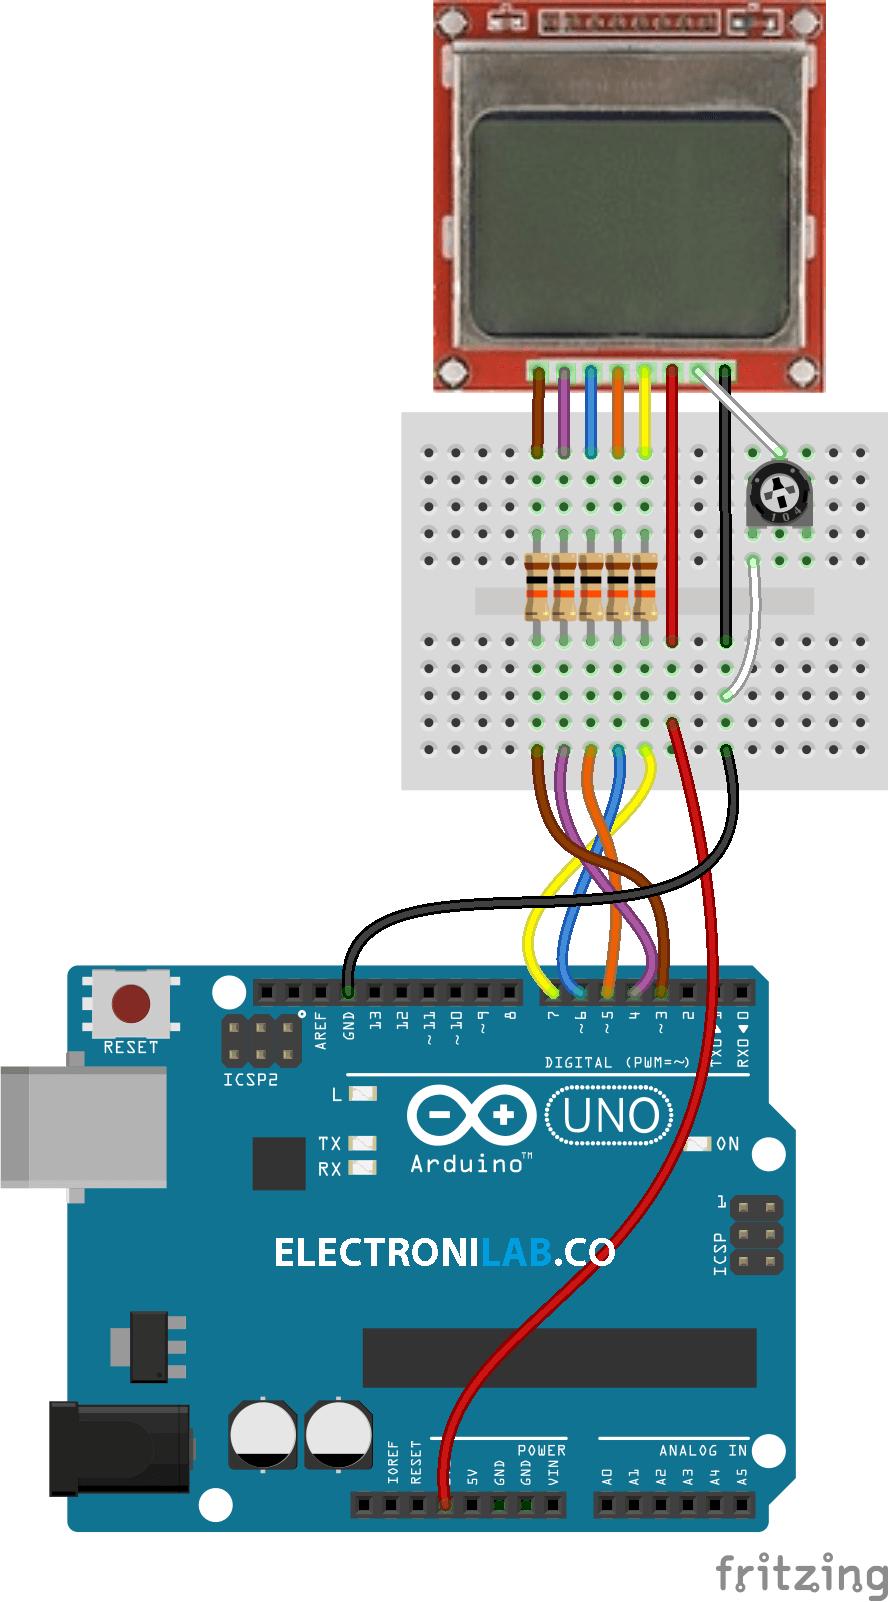 LCD_nokia-5110_Arduino_Electronilab_co-compressor